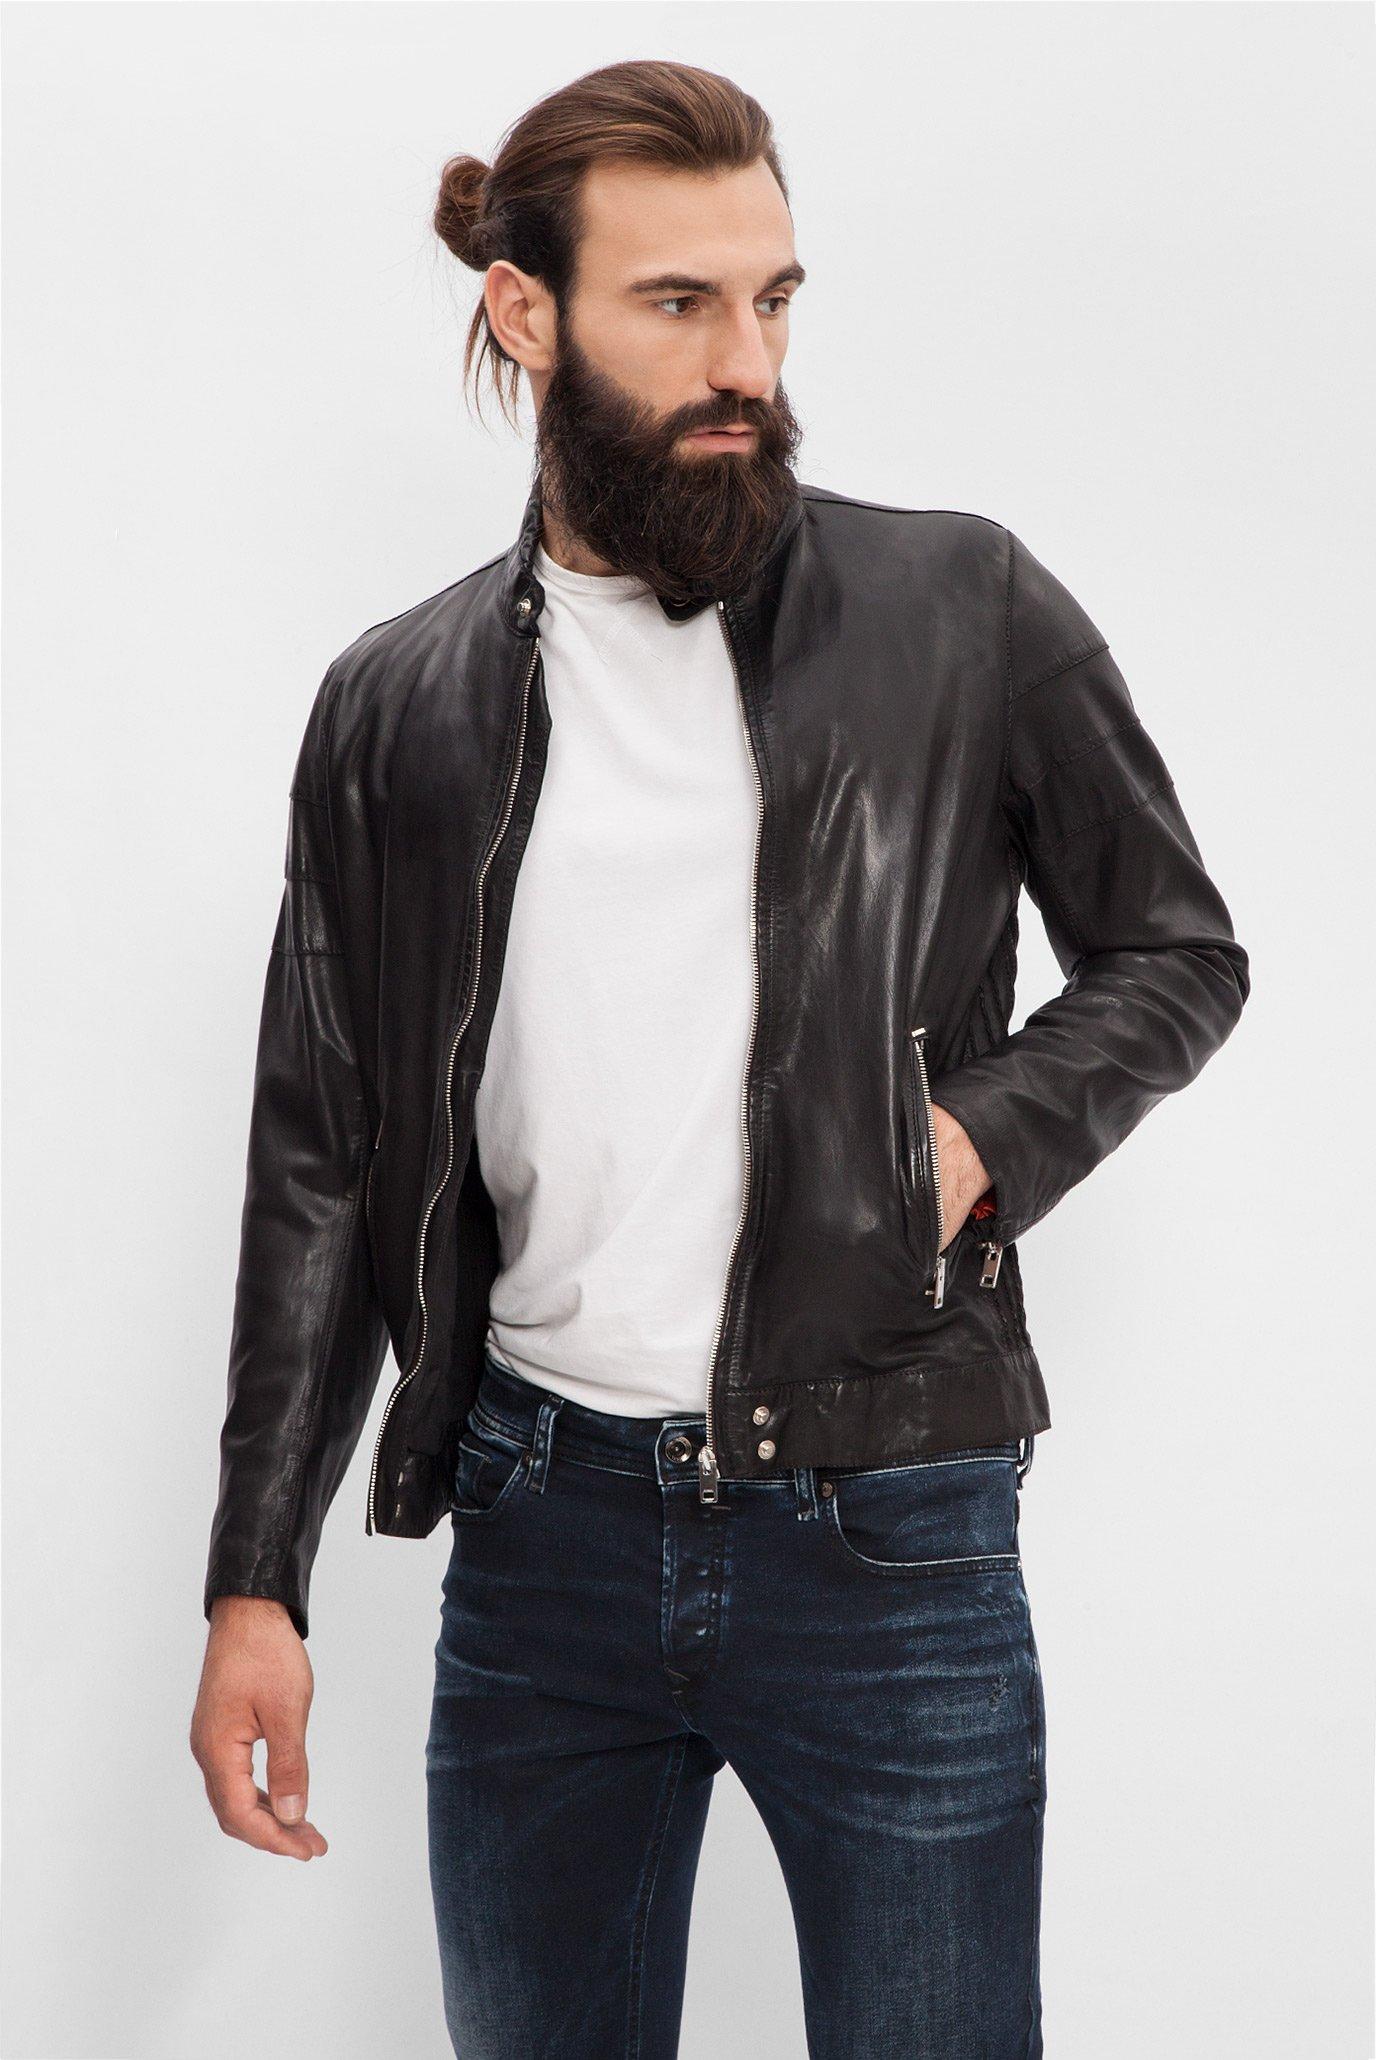 Купить Мужская черная кожаная куртка Diesel Diesel 00S11D 0DAMJ – Киев 2b5772e6be94e